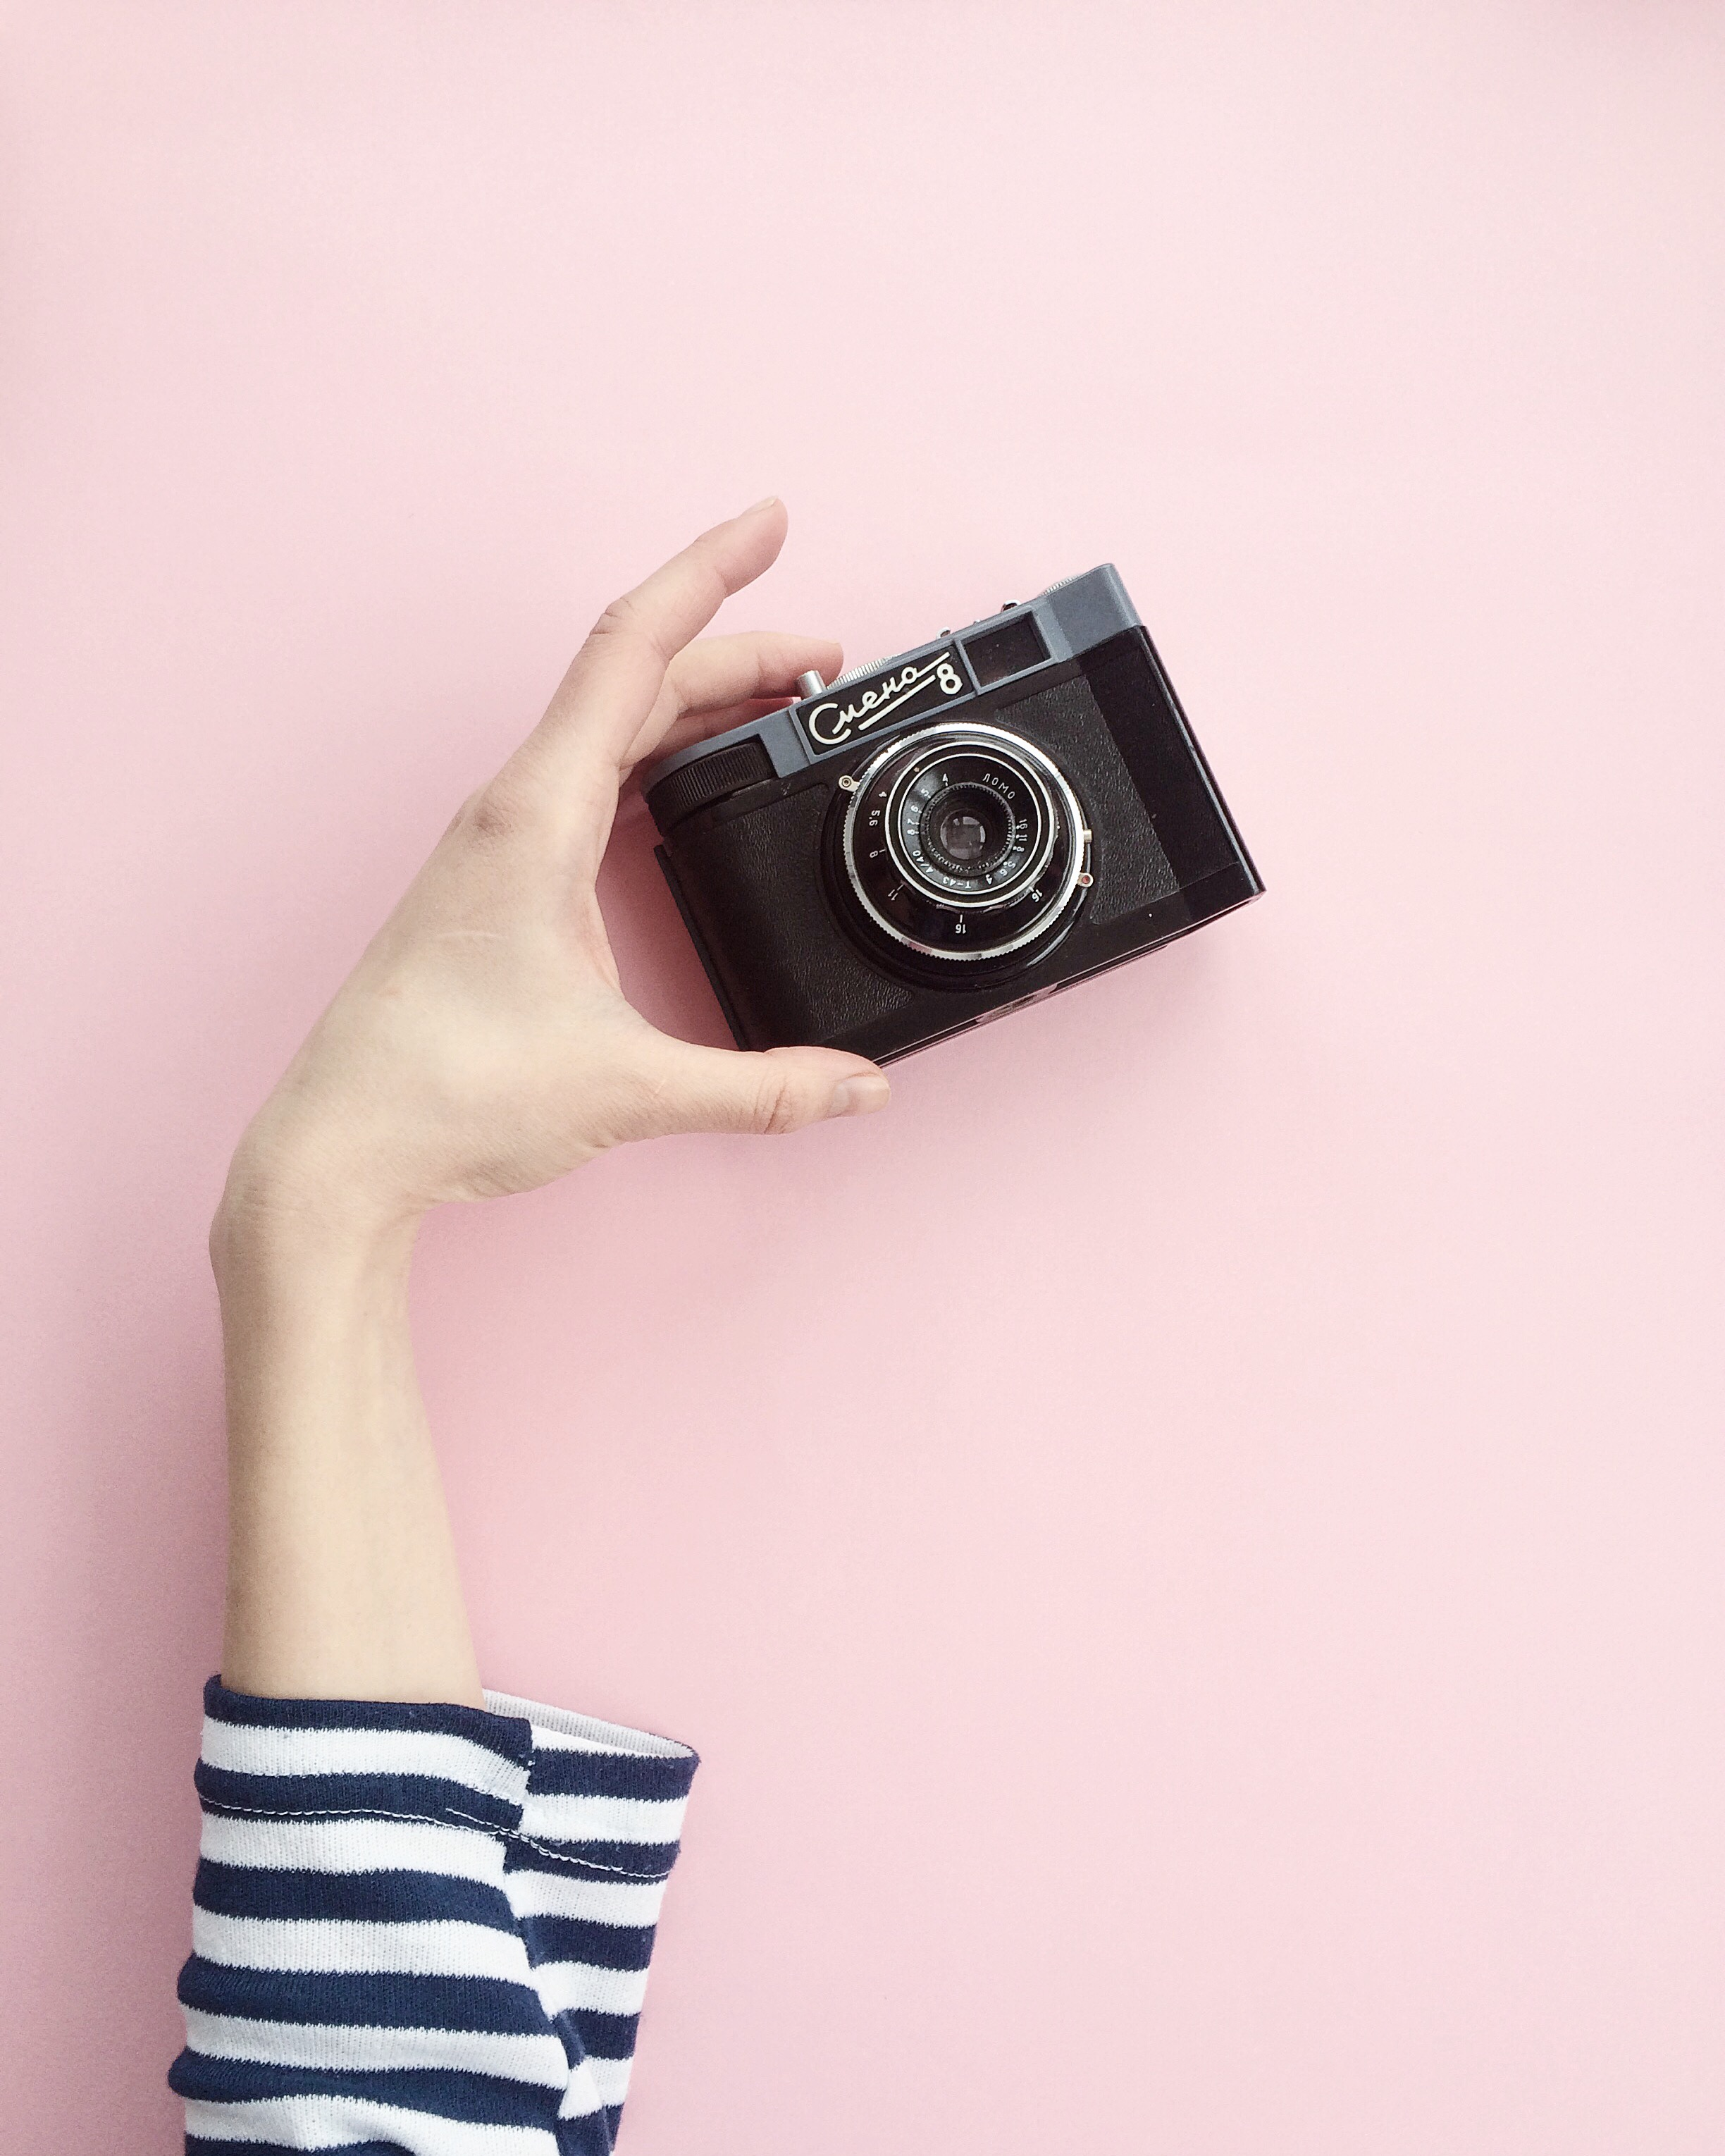 Camera Girl Photography Wallpaper Person Holding Black Canon Dslr Camera Shallow Focus